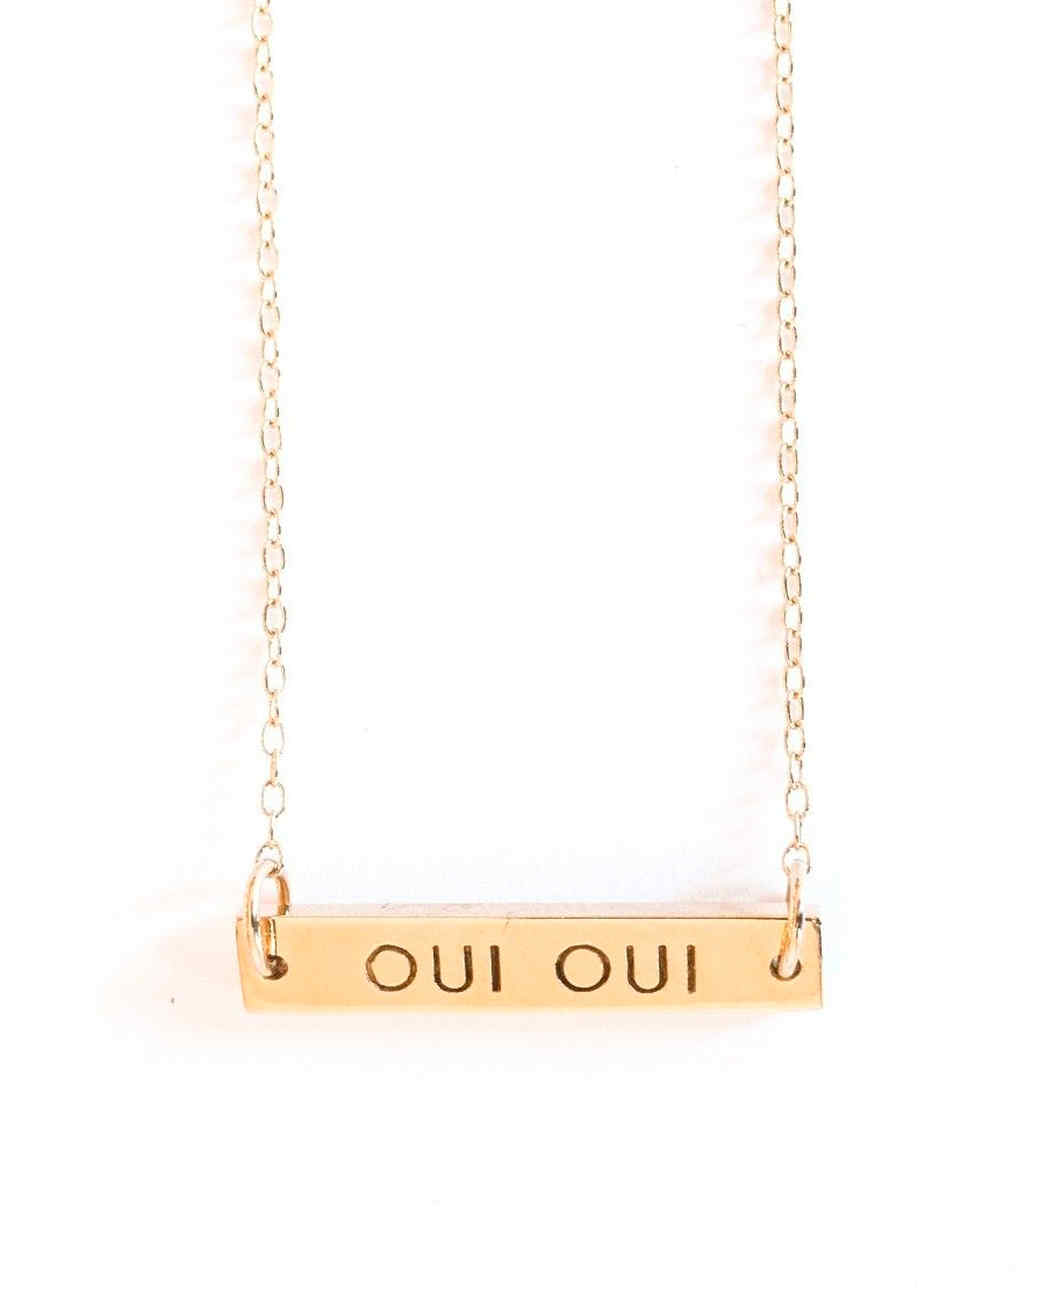 honeyandbloom-oui-oui-pendant-necklace-0915.jpg